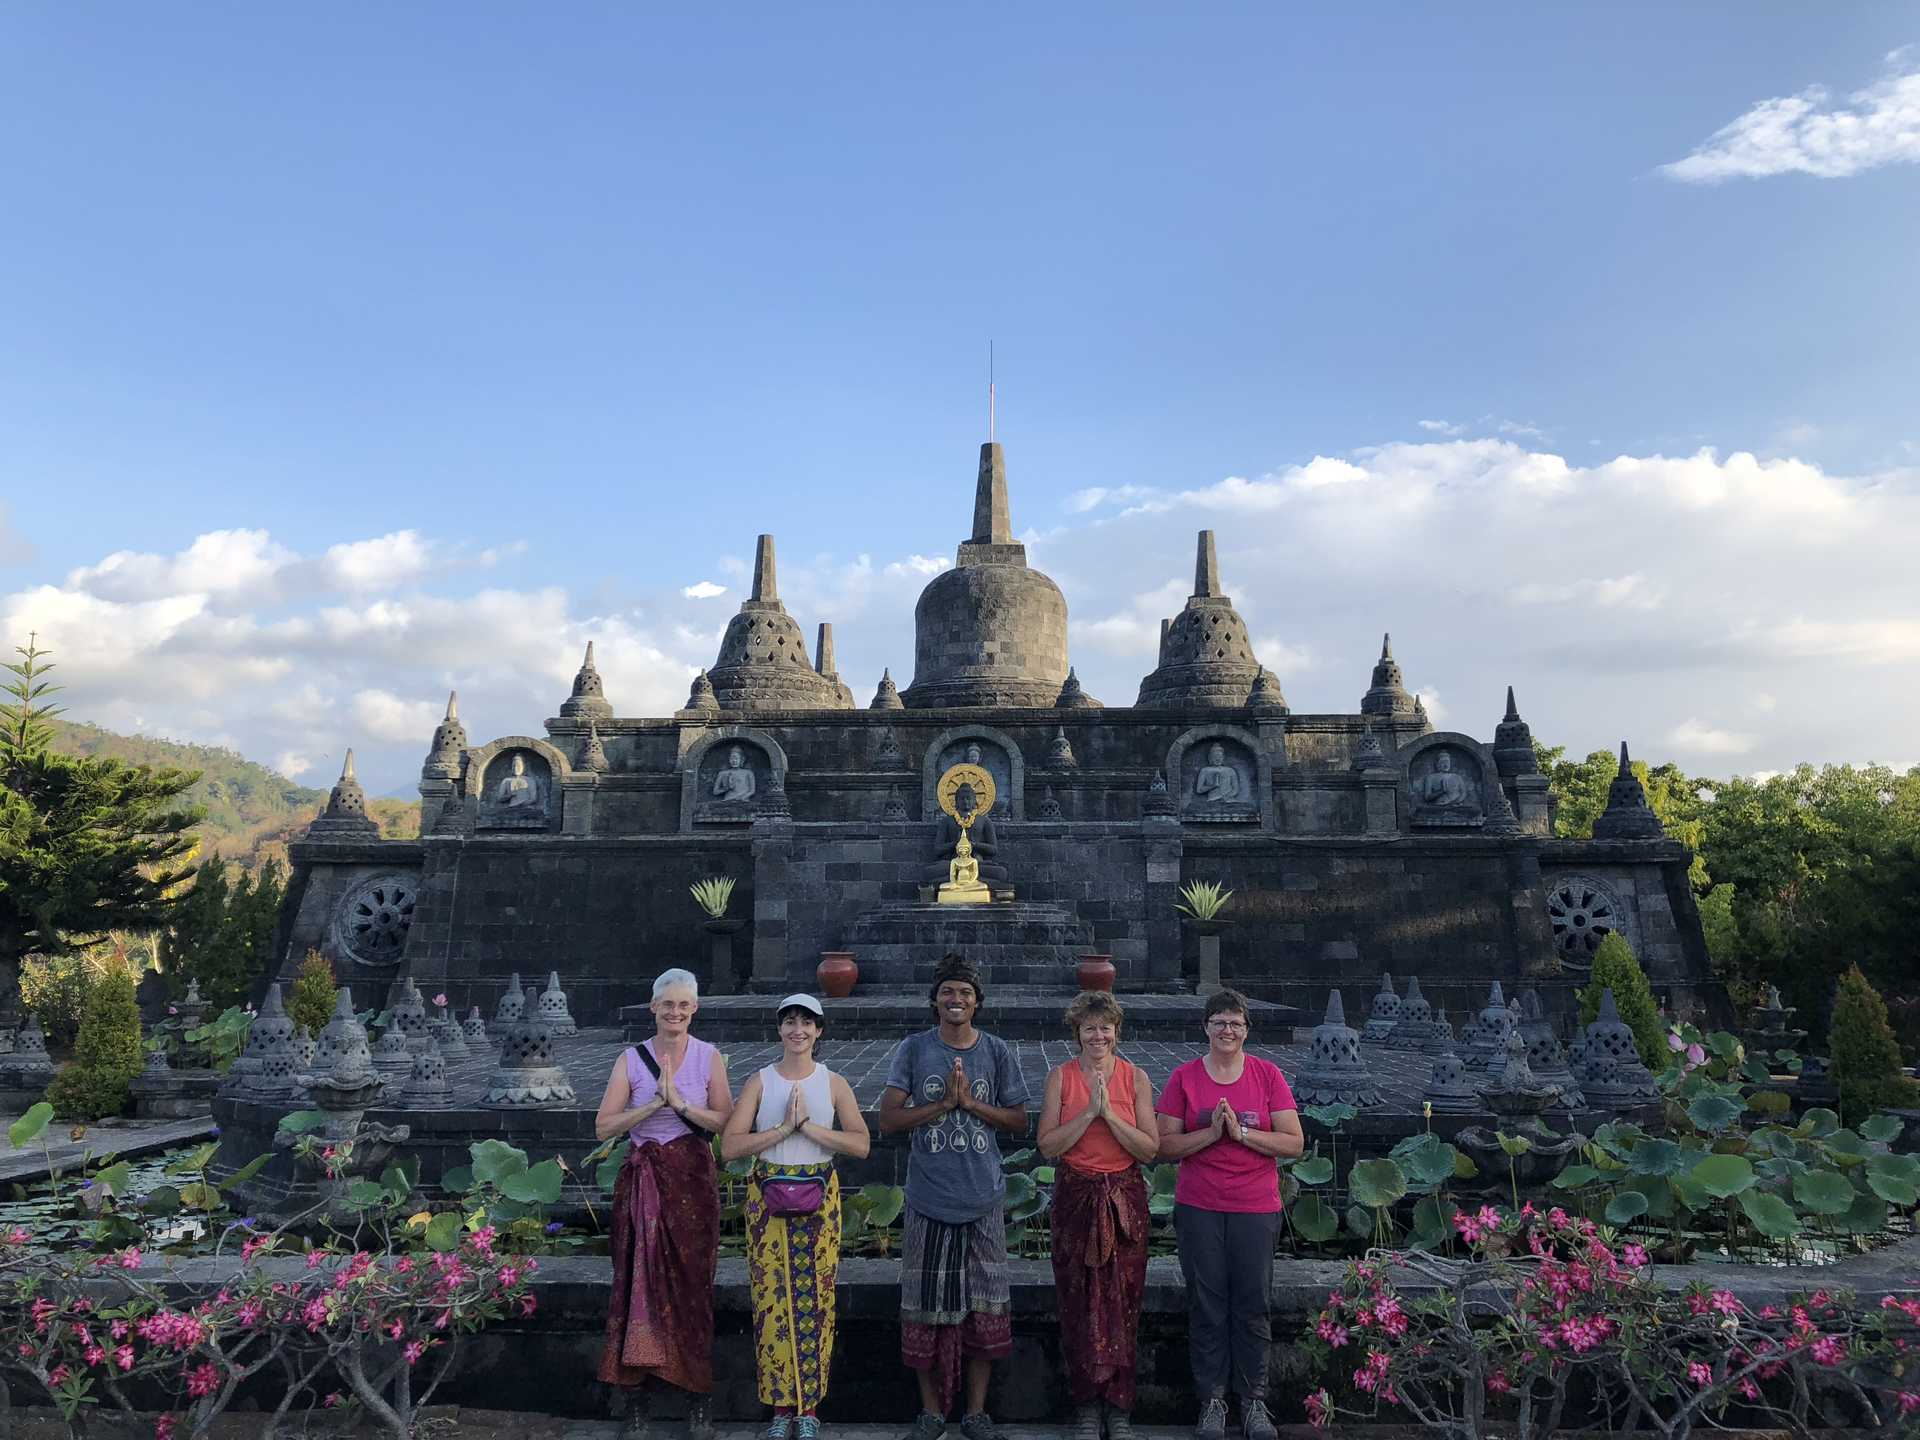 Voyageurs au temple Brama Vihara, Bali, Indonésie